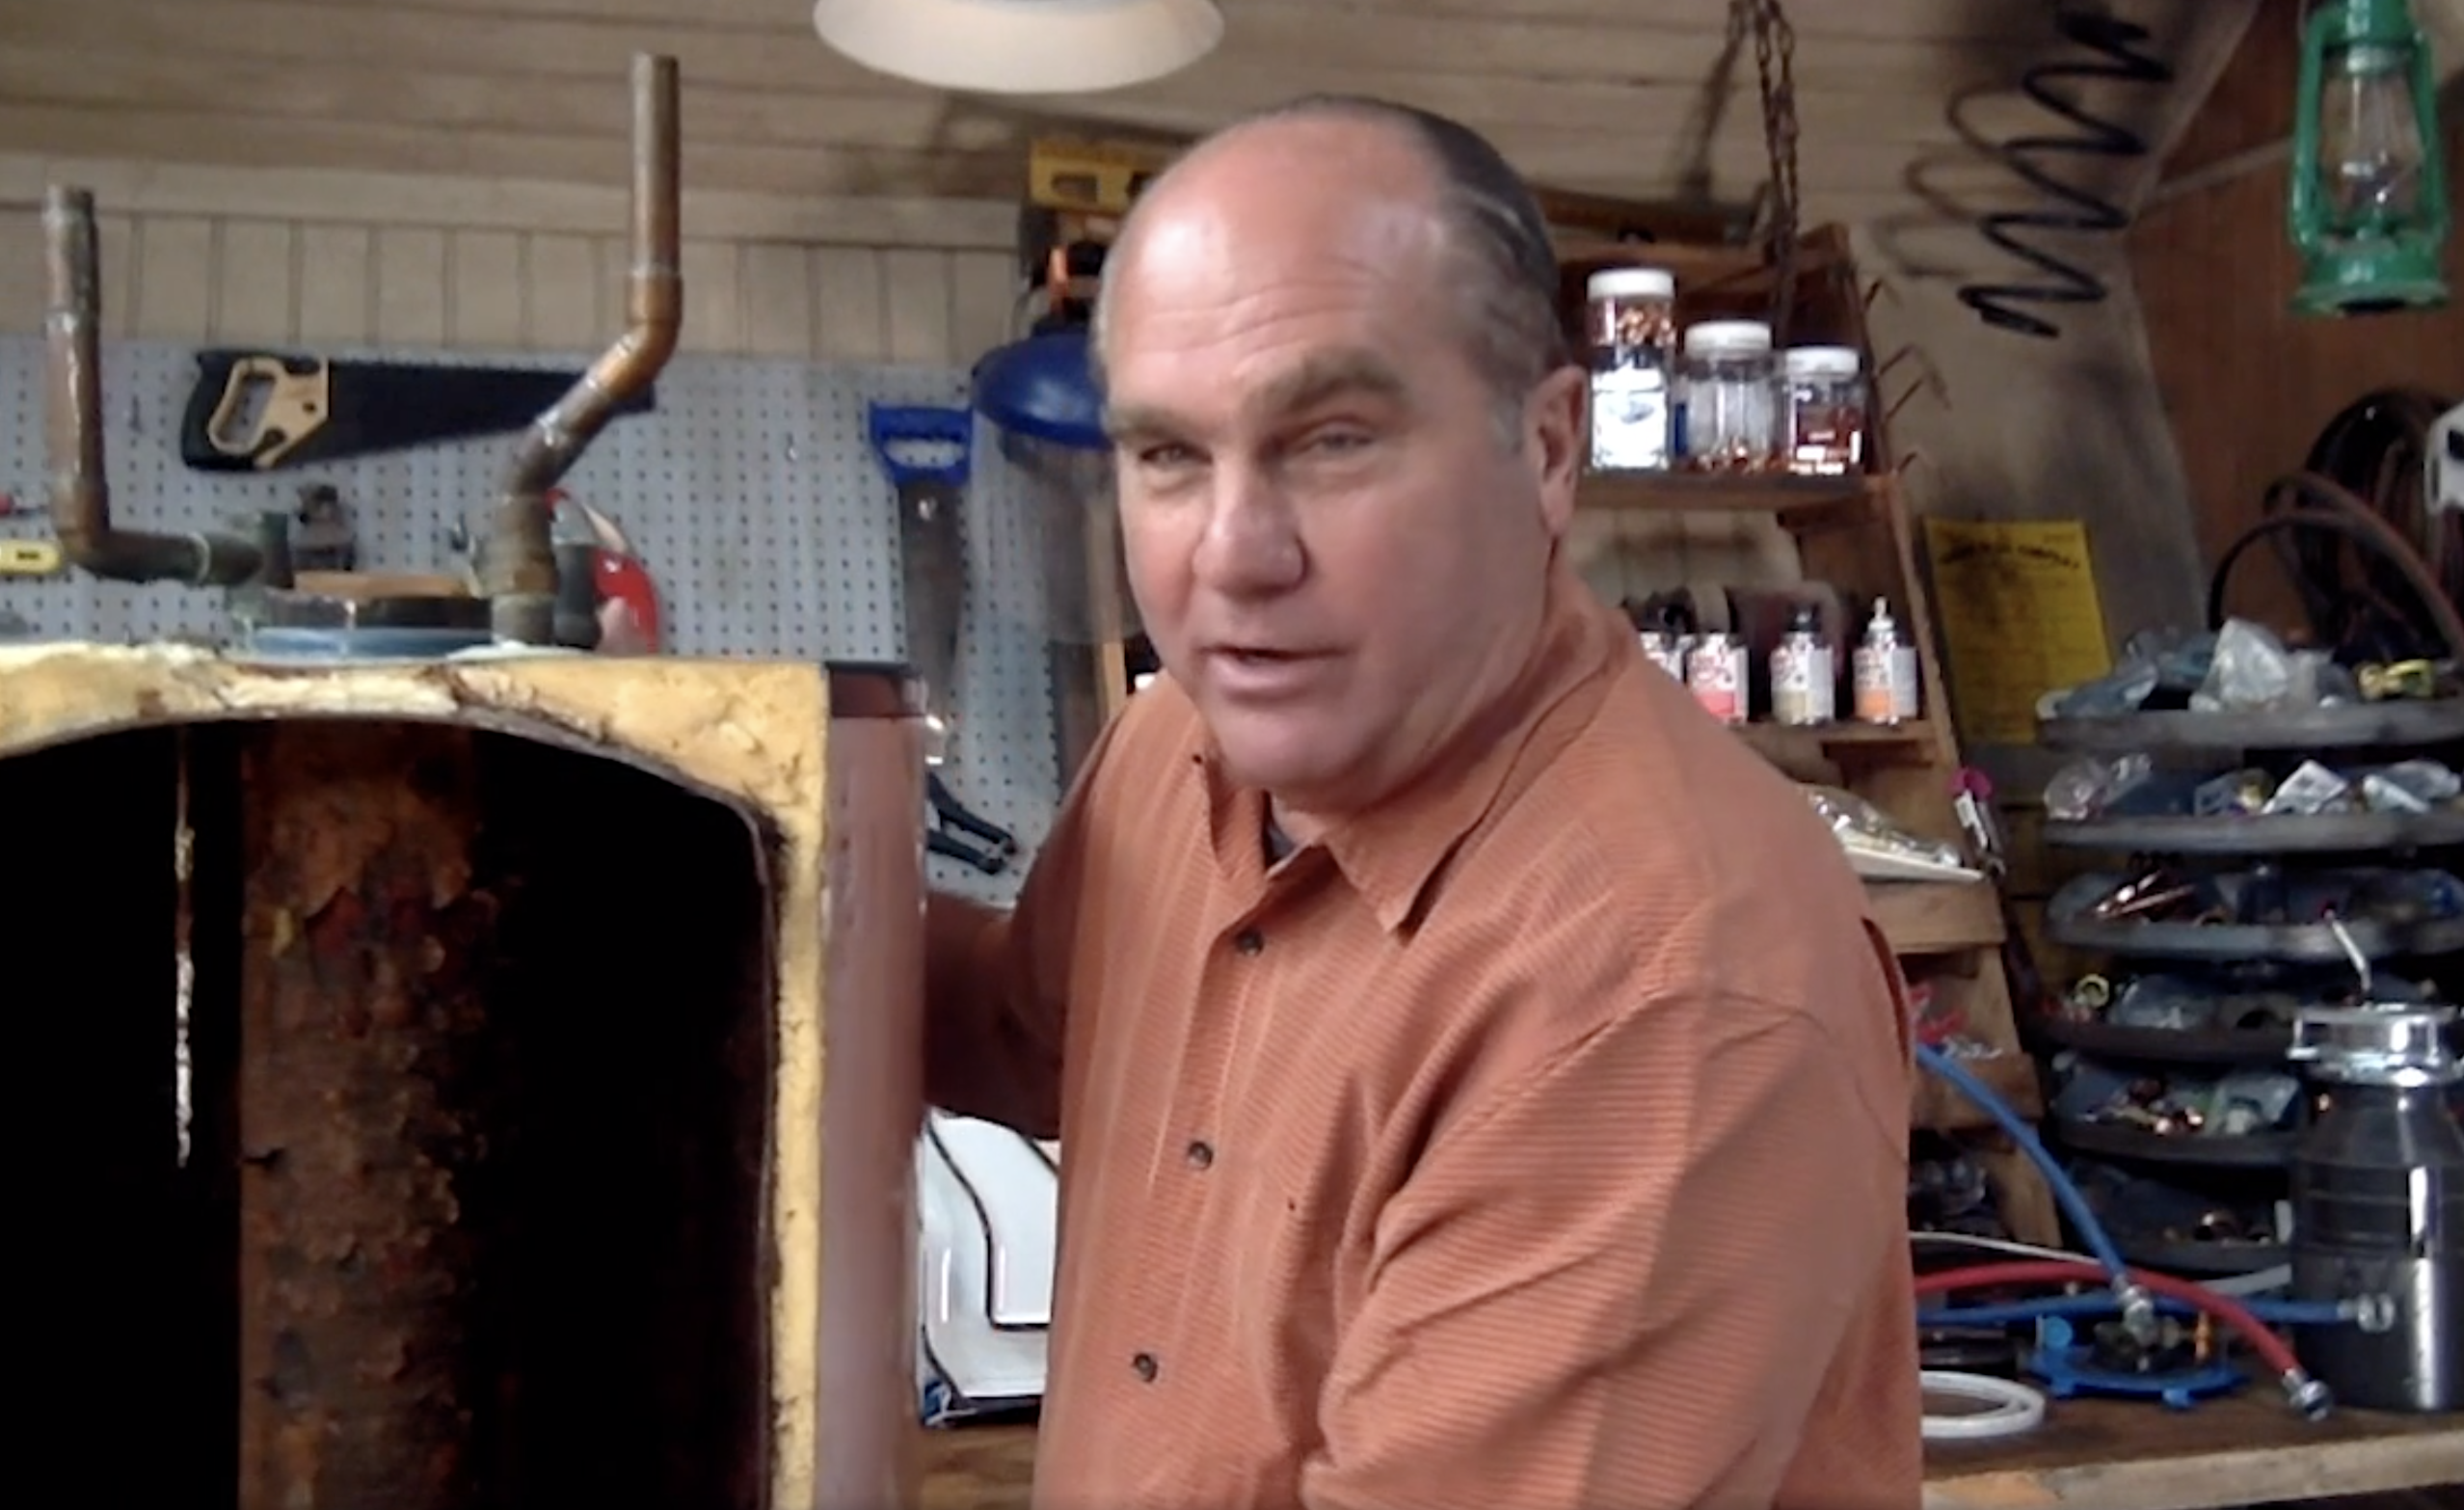 Richard Trethewey shows corrosion inside a water heater.